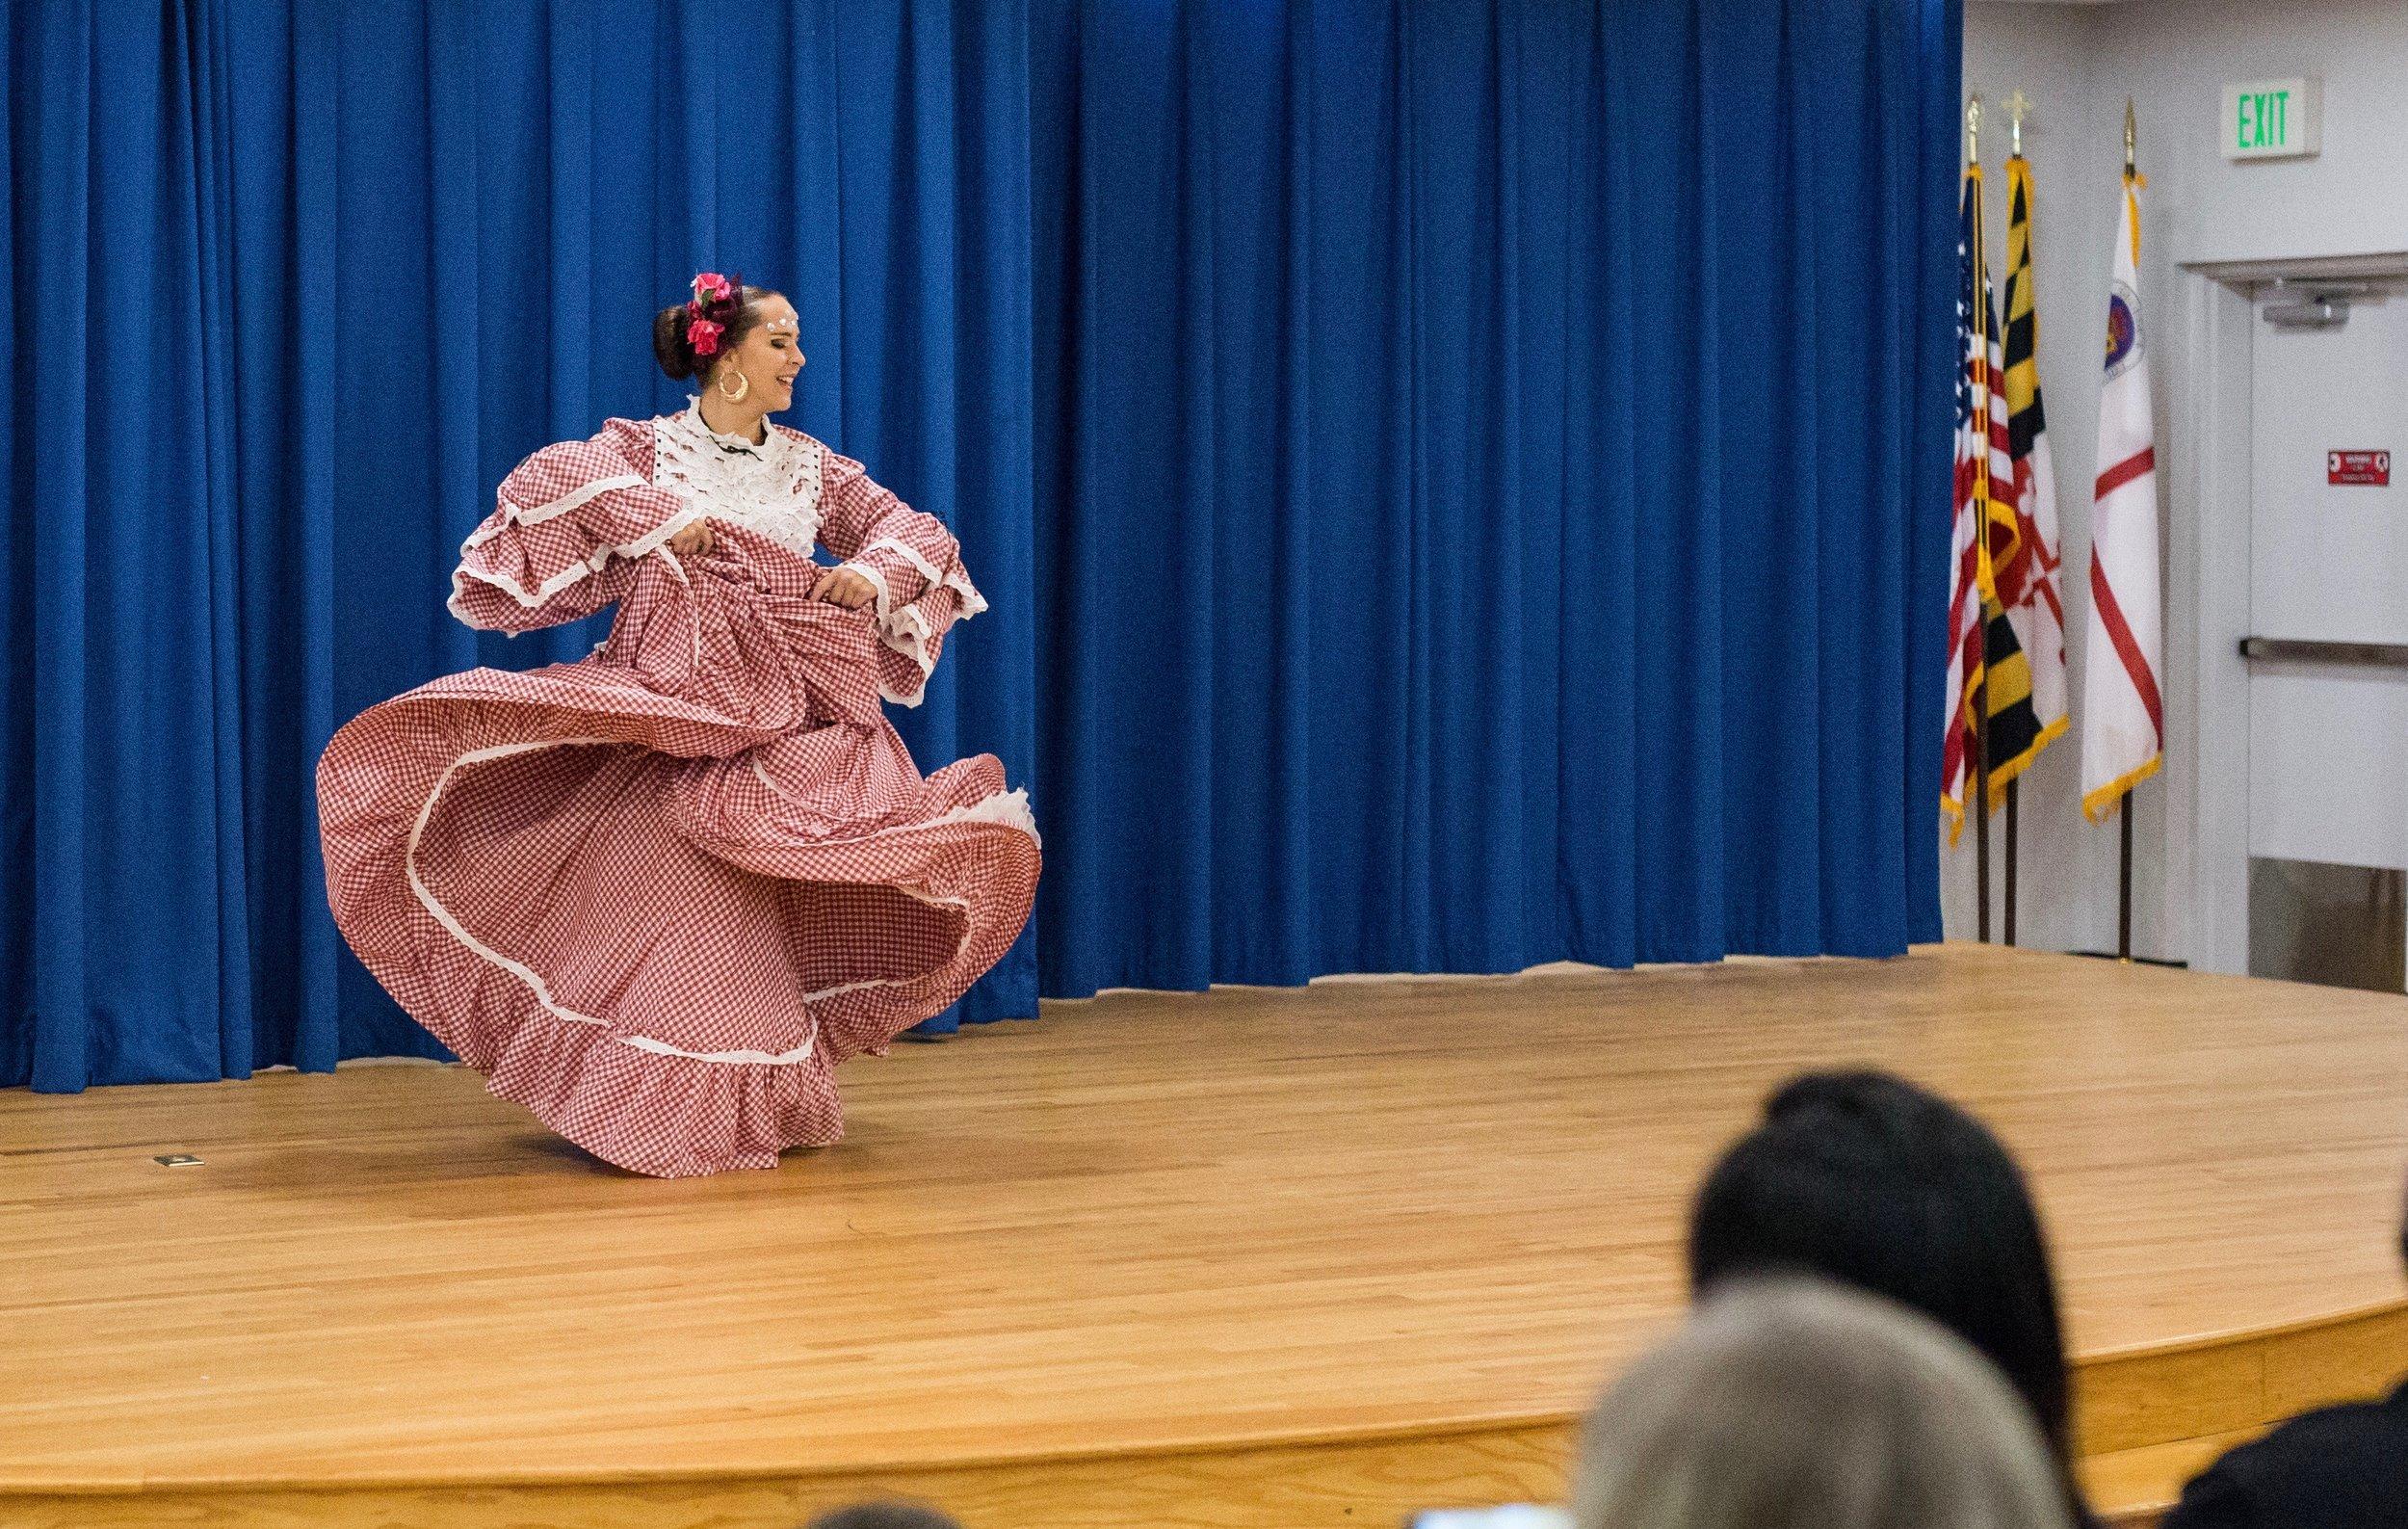 Cumbia Folkloric Performance